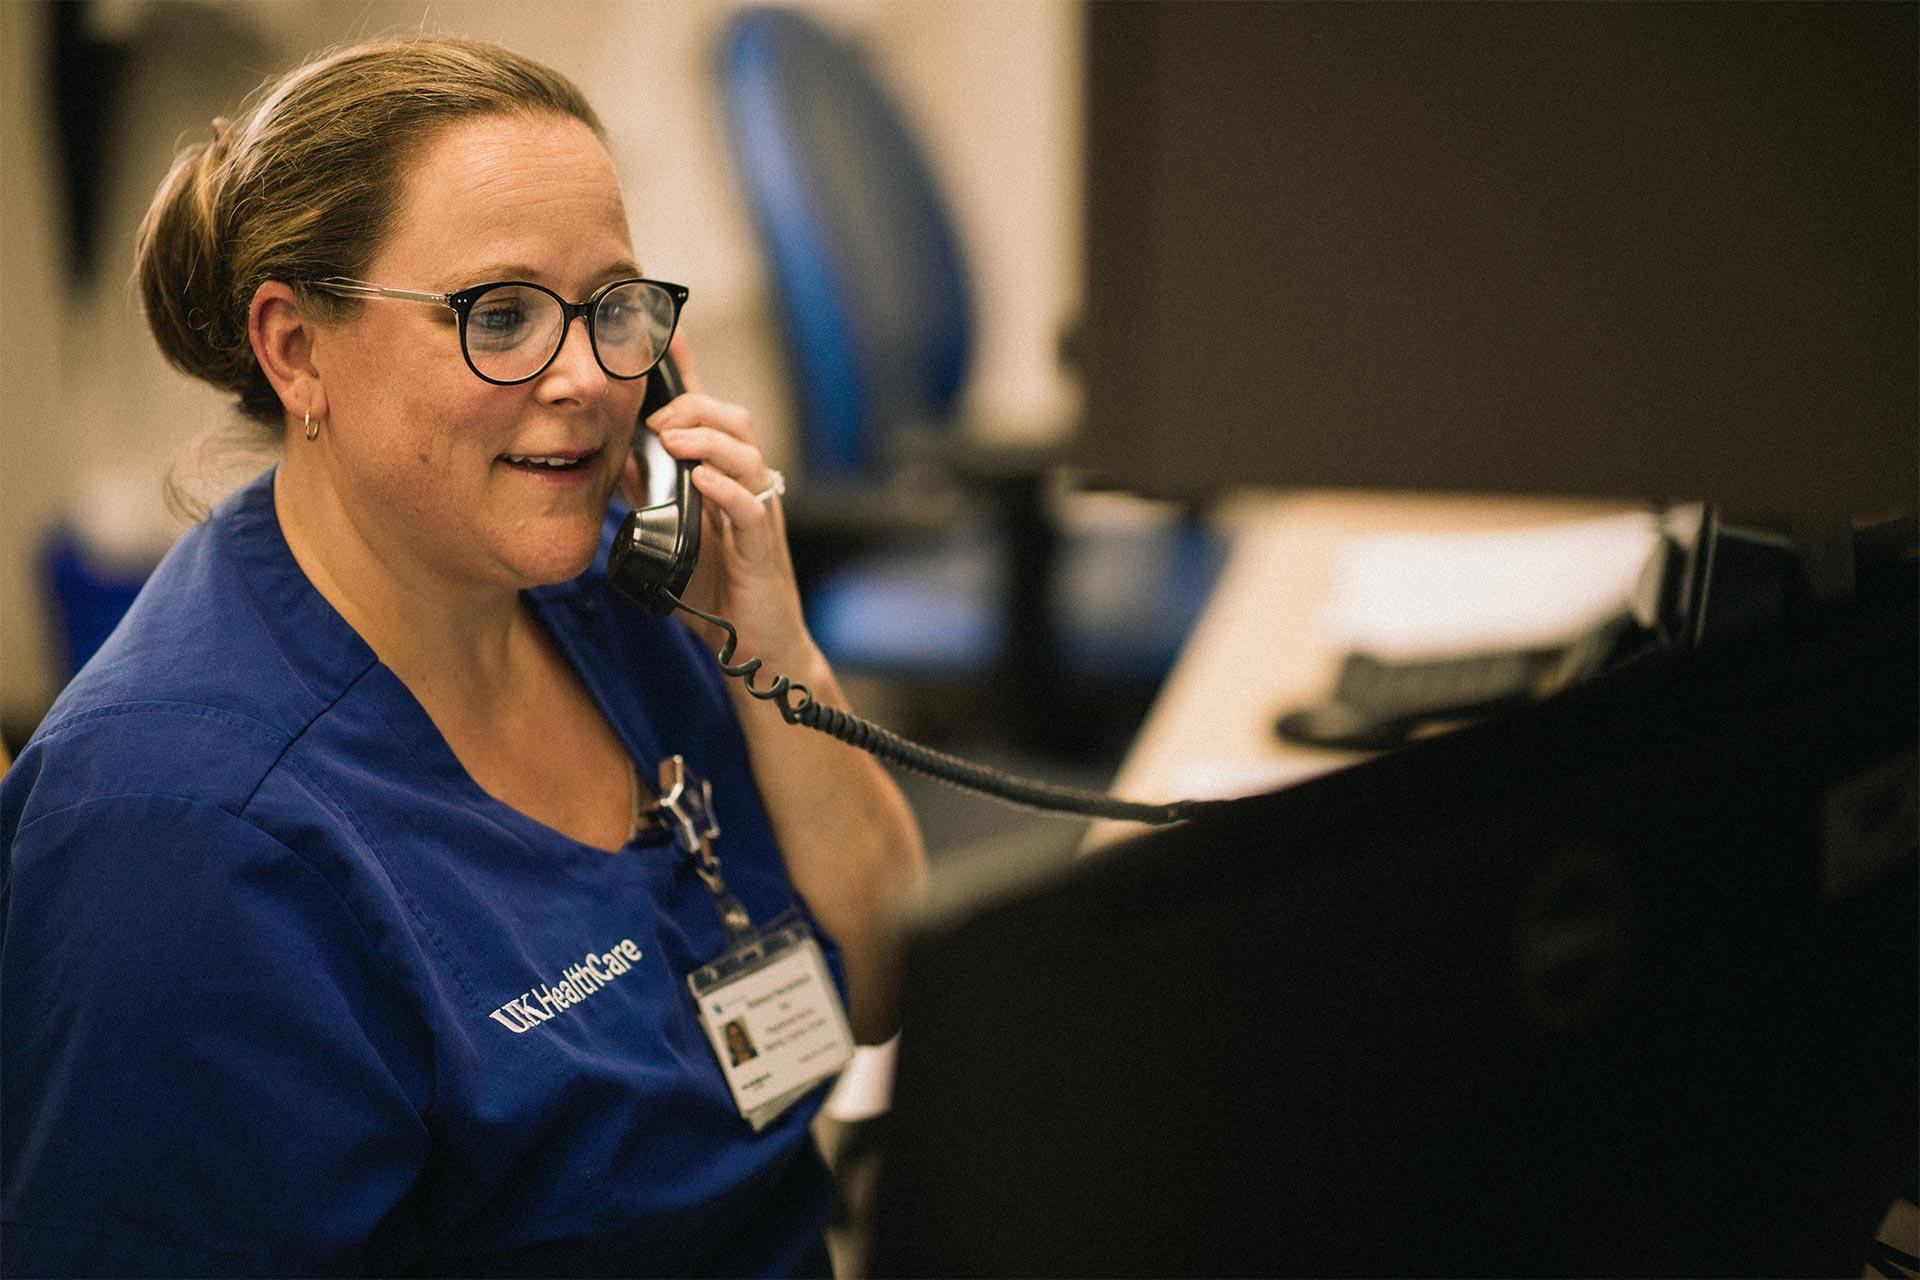 Rebecca Heichelbech, a nurse at the Markey Cancer Center